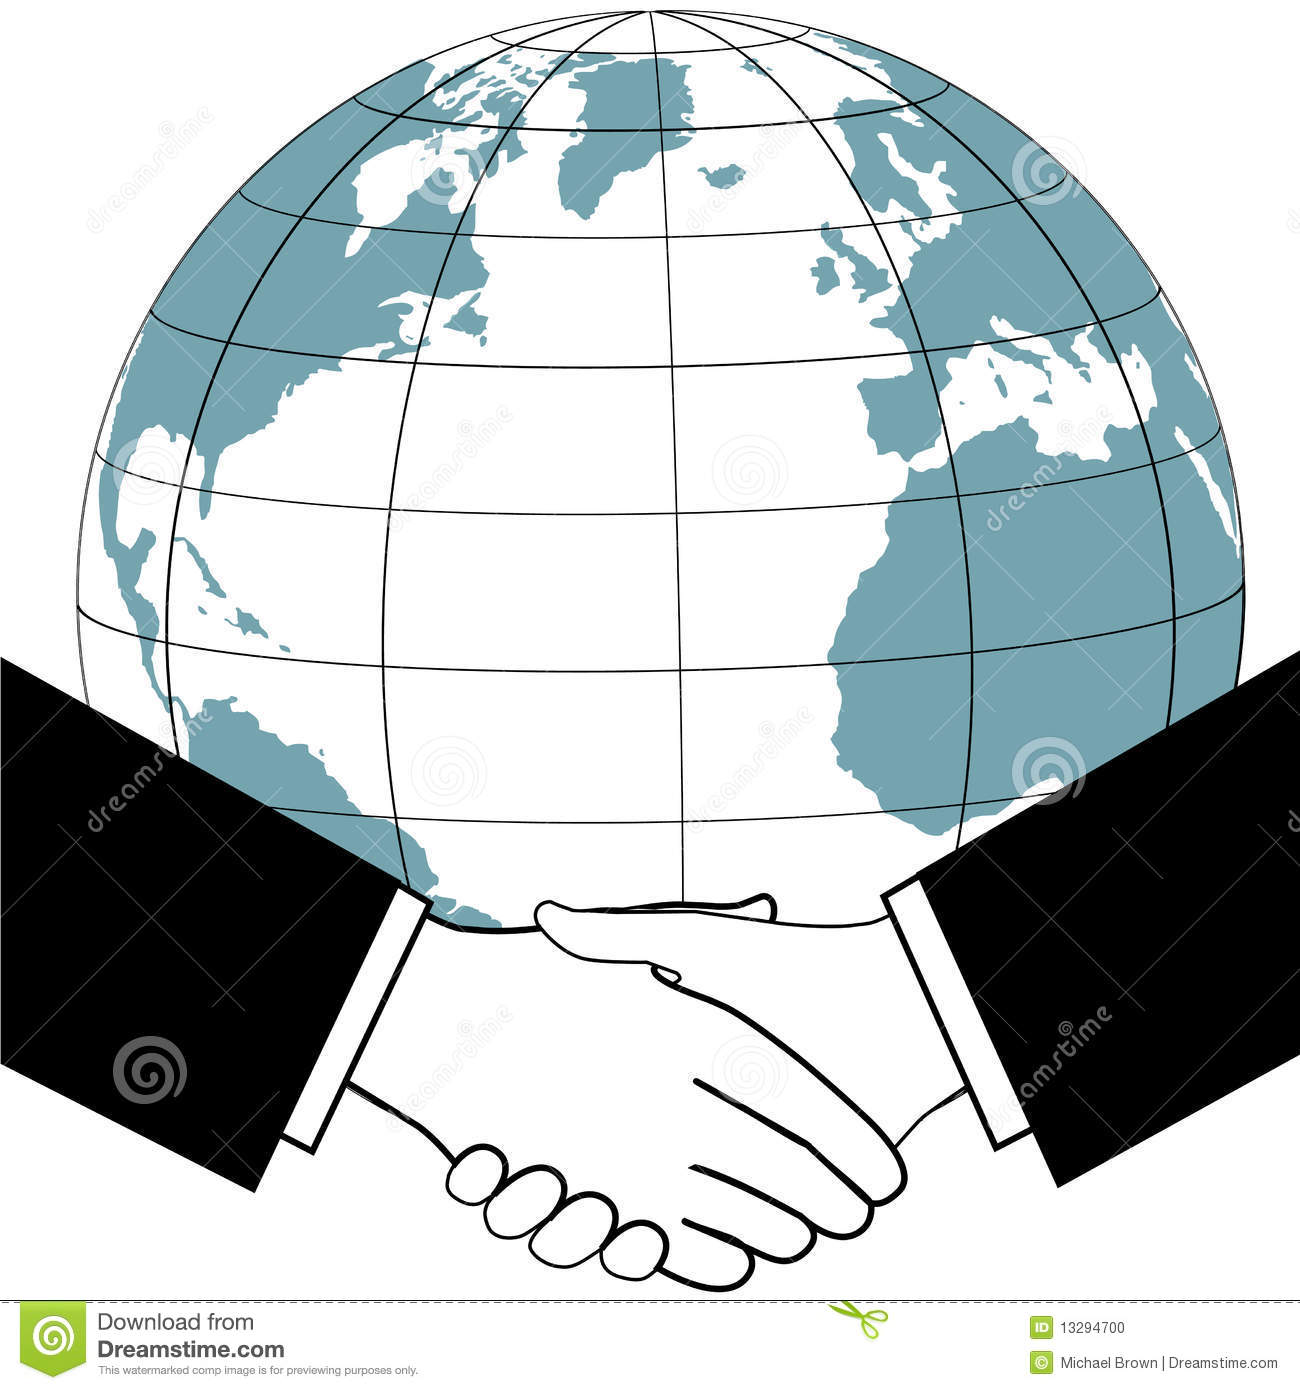 Global Business Trade Agreement Handshake Stock Vector.